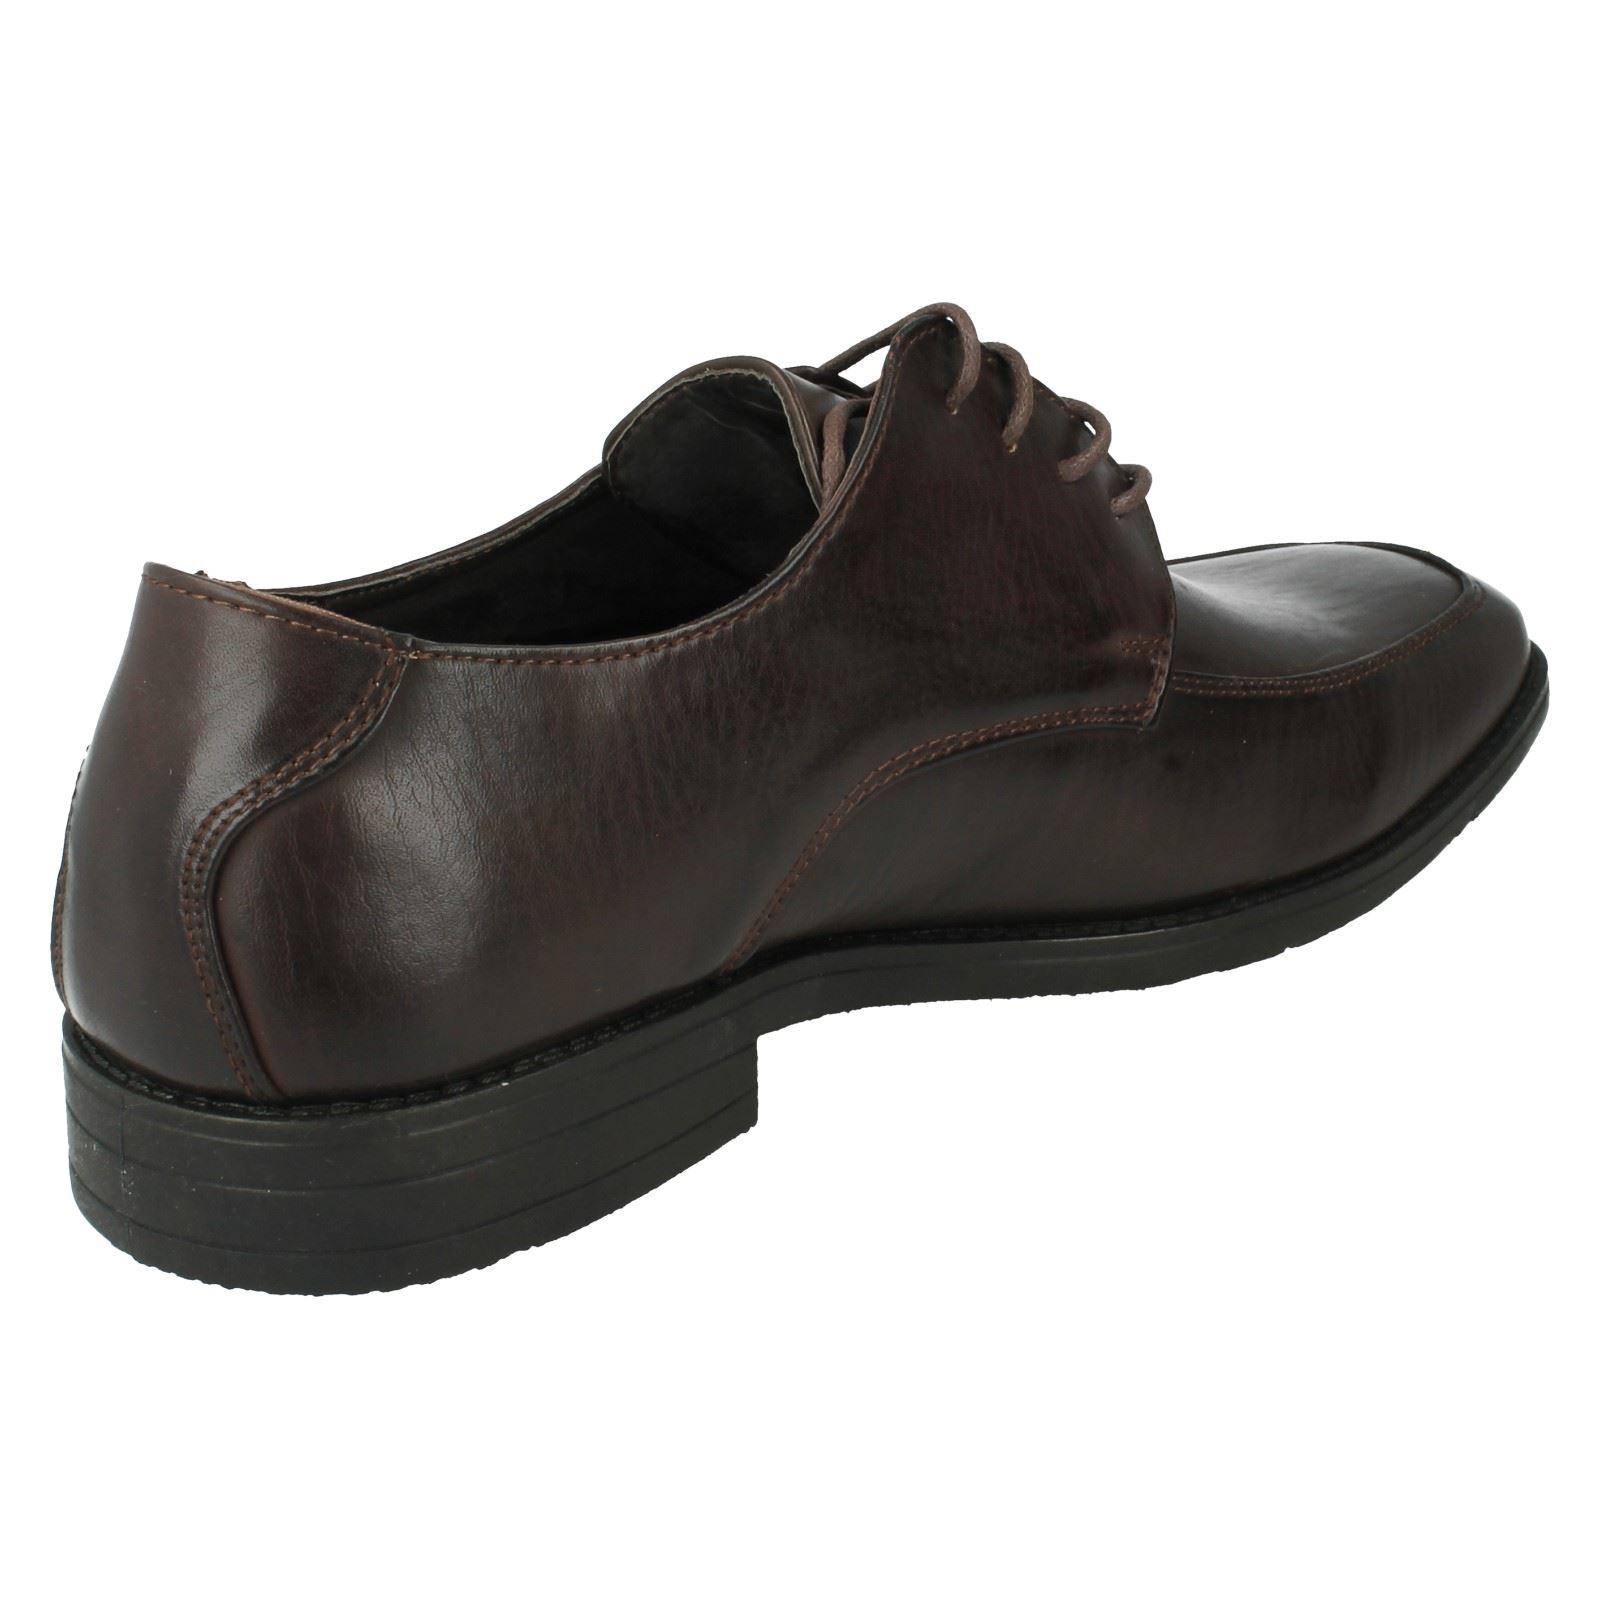 Para Hombre Malvern formal Zapatos Estilo-A2102